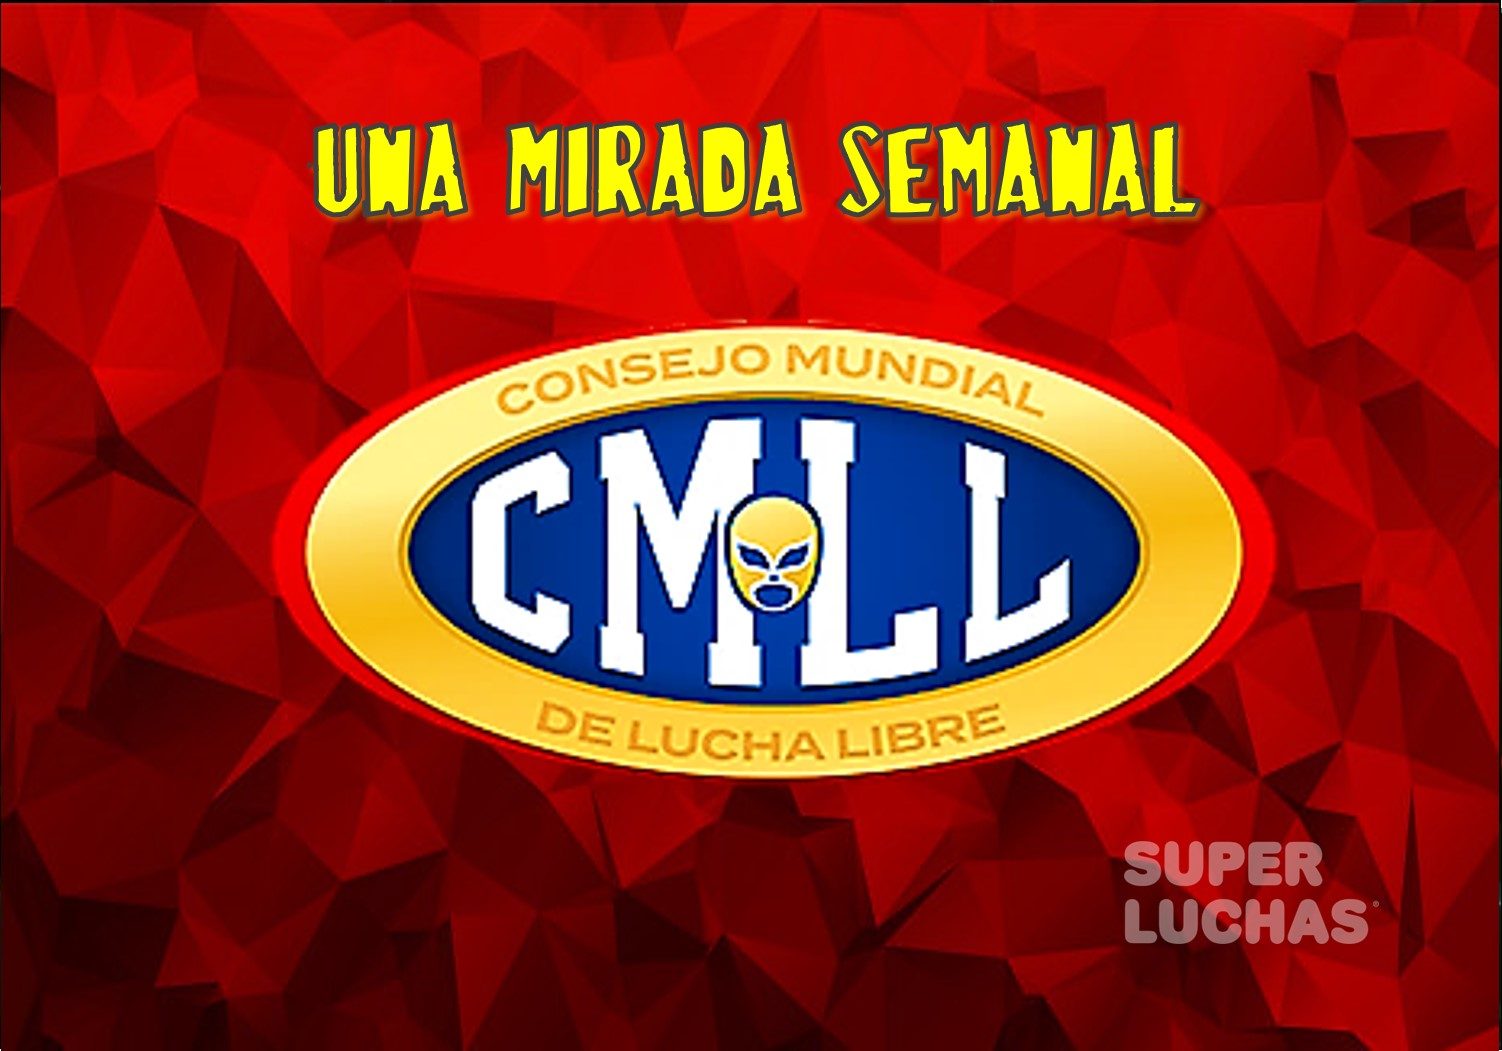 Una mirada semanal al CMLL (del 5 al 11 septiembre de 2019) 2